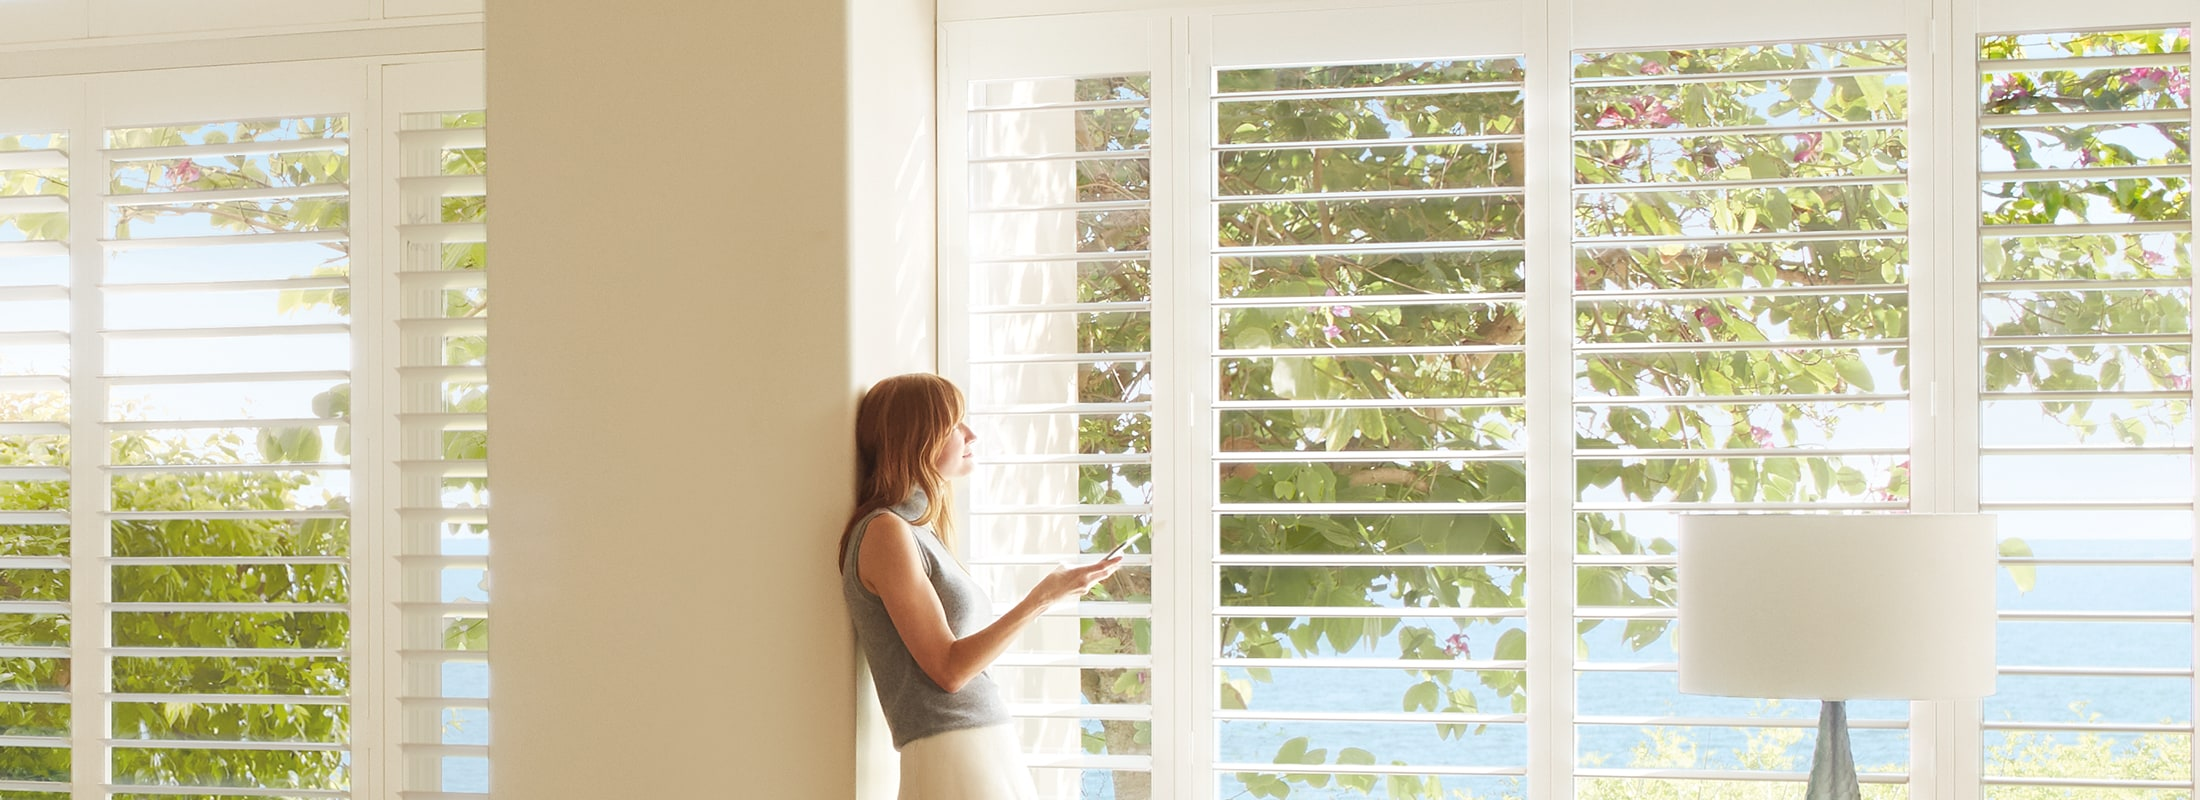 Polysatin shutters in Shutters Bright White - Palm Beach